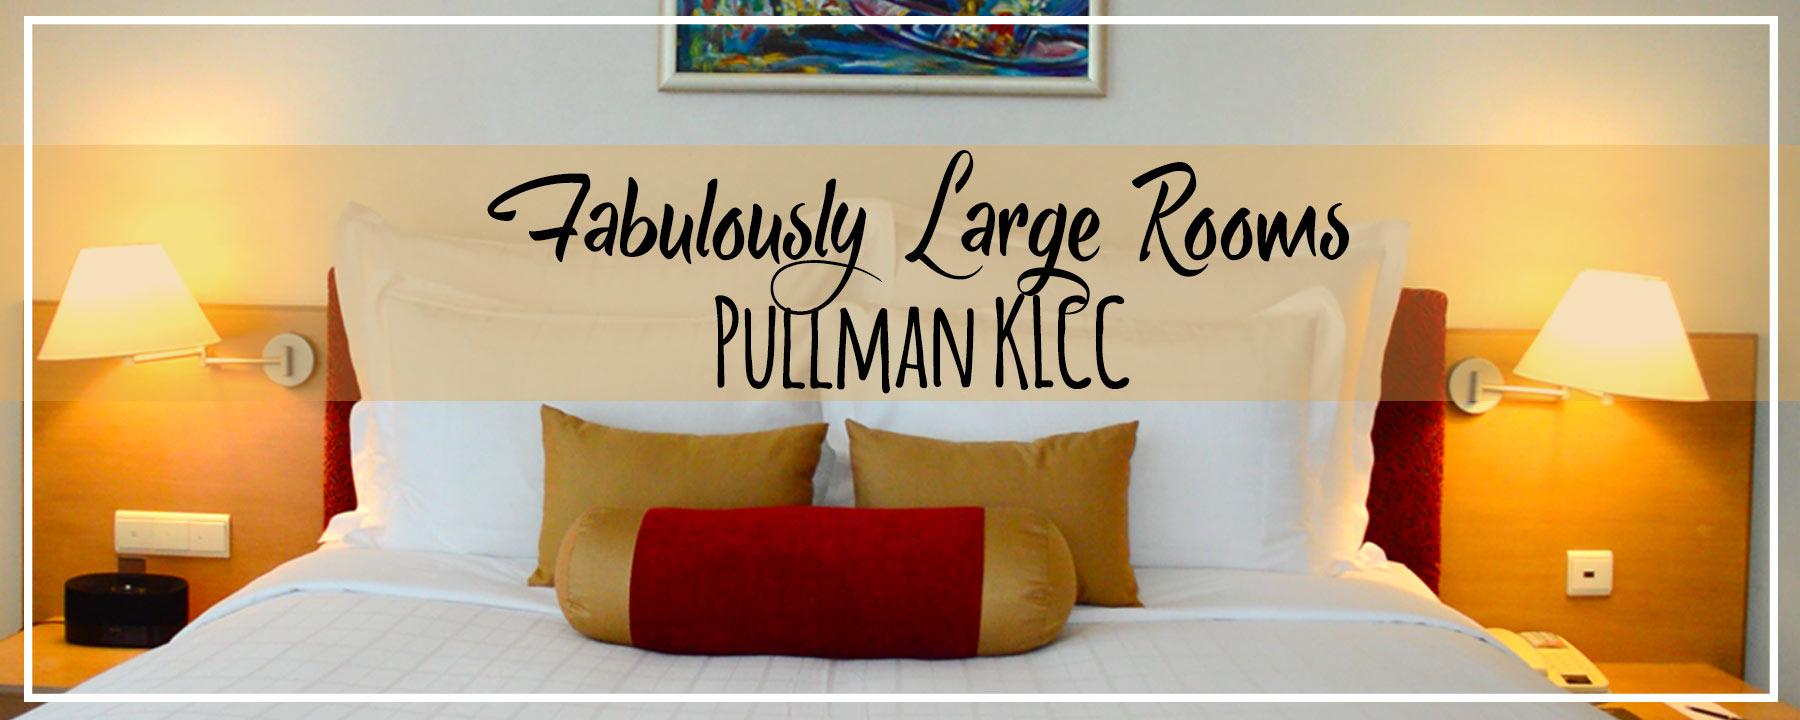 Pullman KLCC Hotel Tour | Huge Executive Club Rooms, Great Premier Lounge Service in Kuala Lumpur